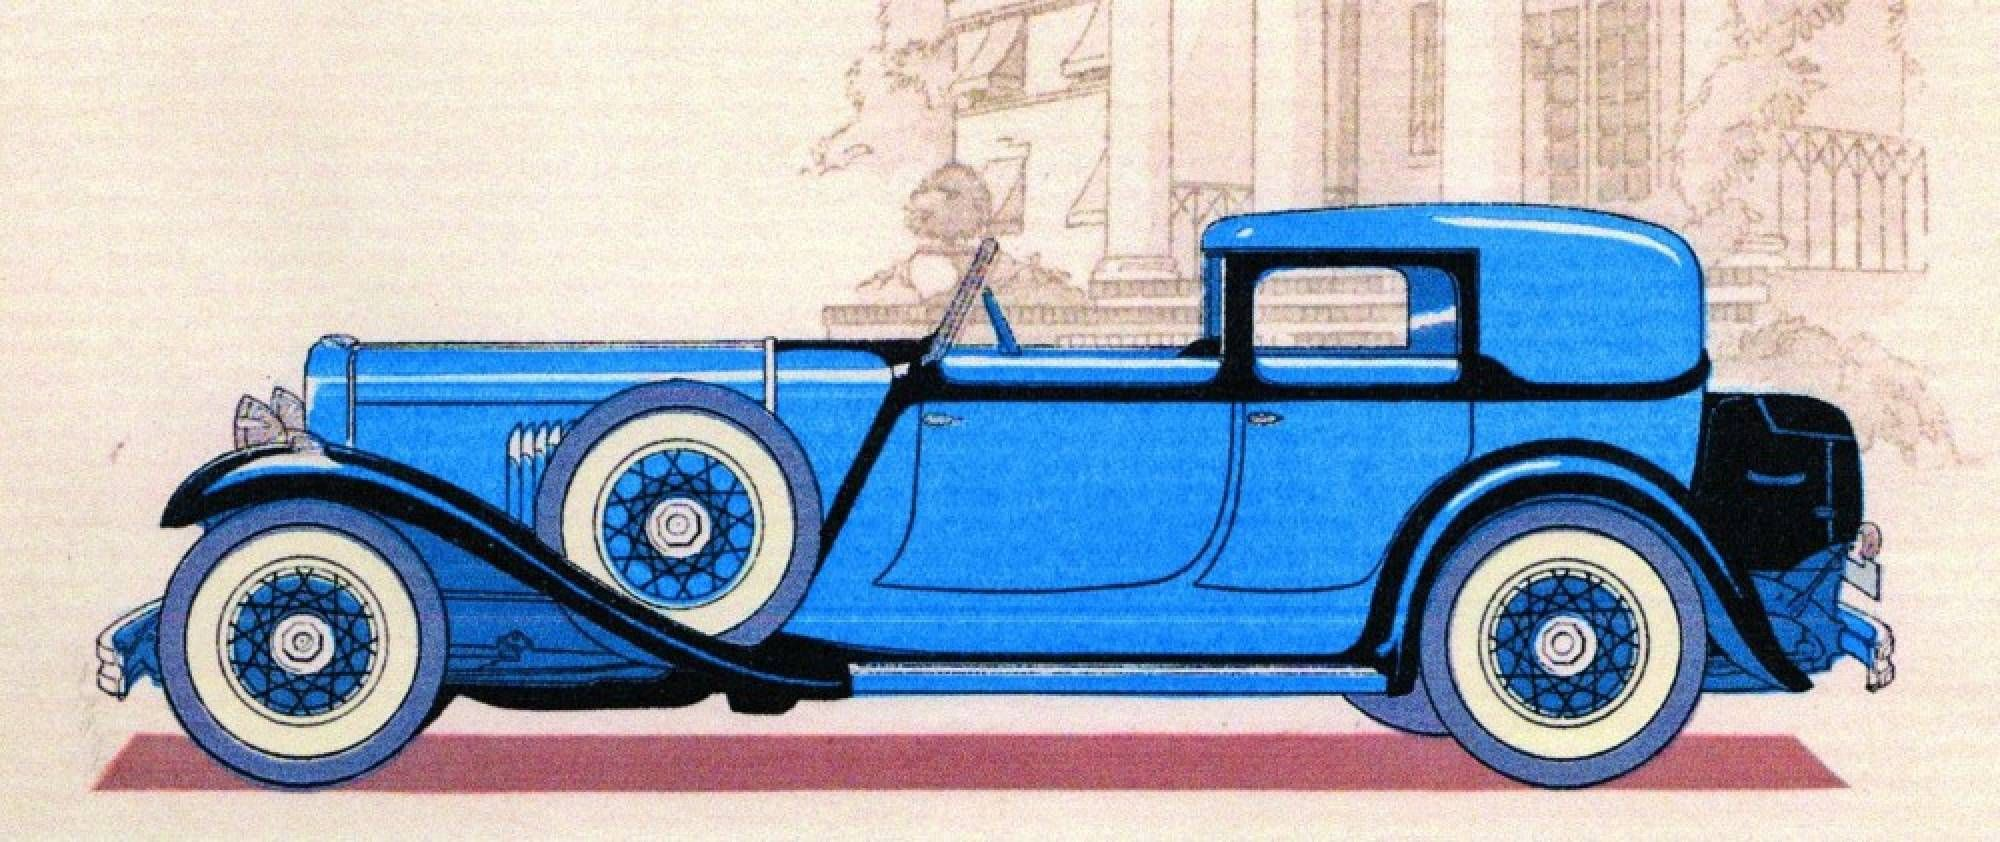 1930 DuPont Model G Town Car by Waterhouse of Merrimac, | Car ...